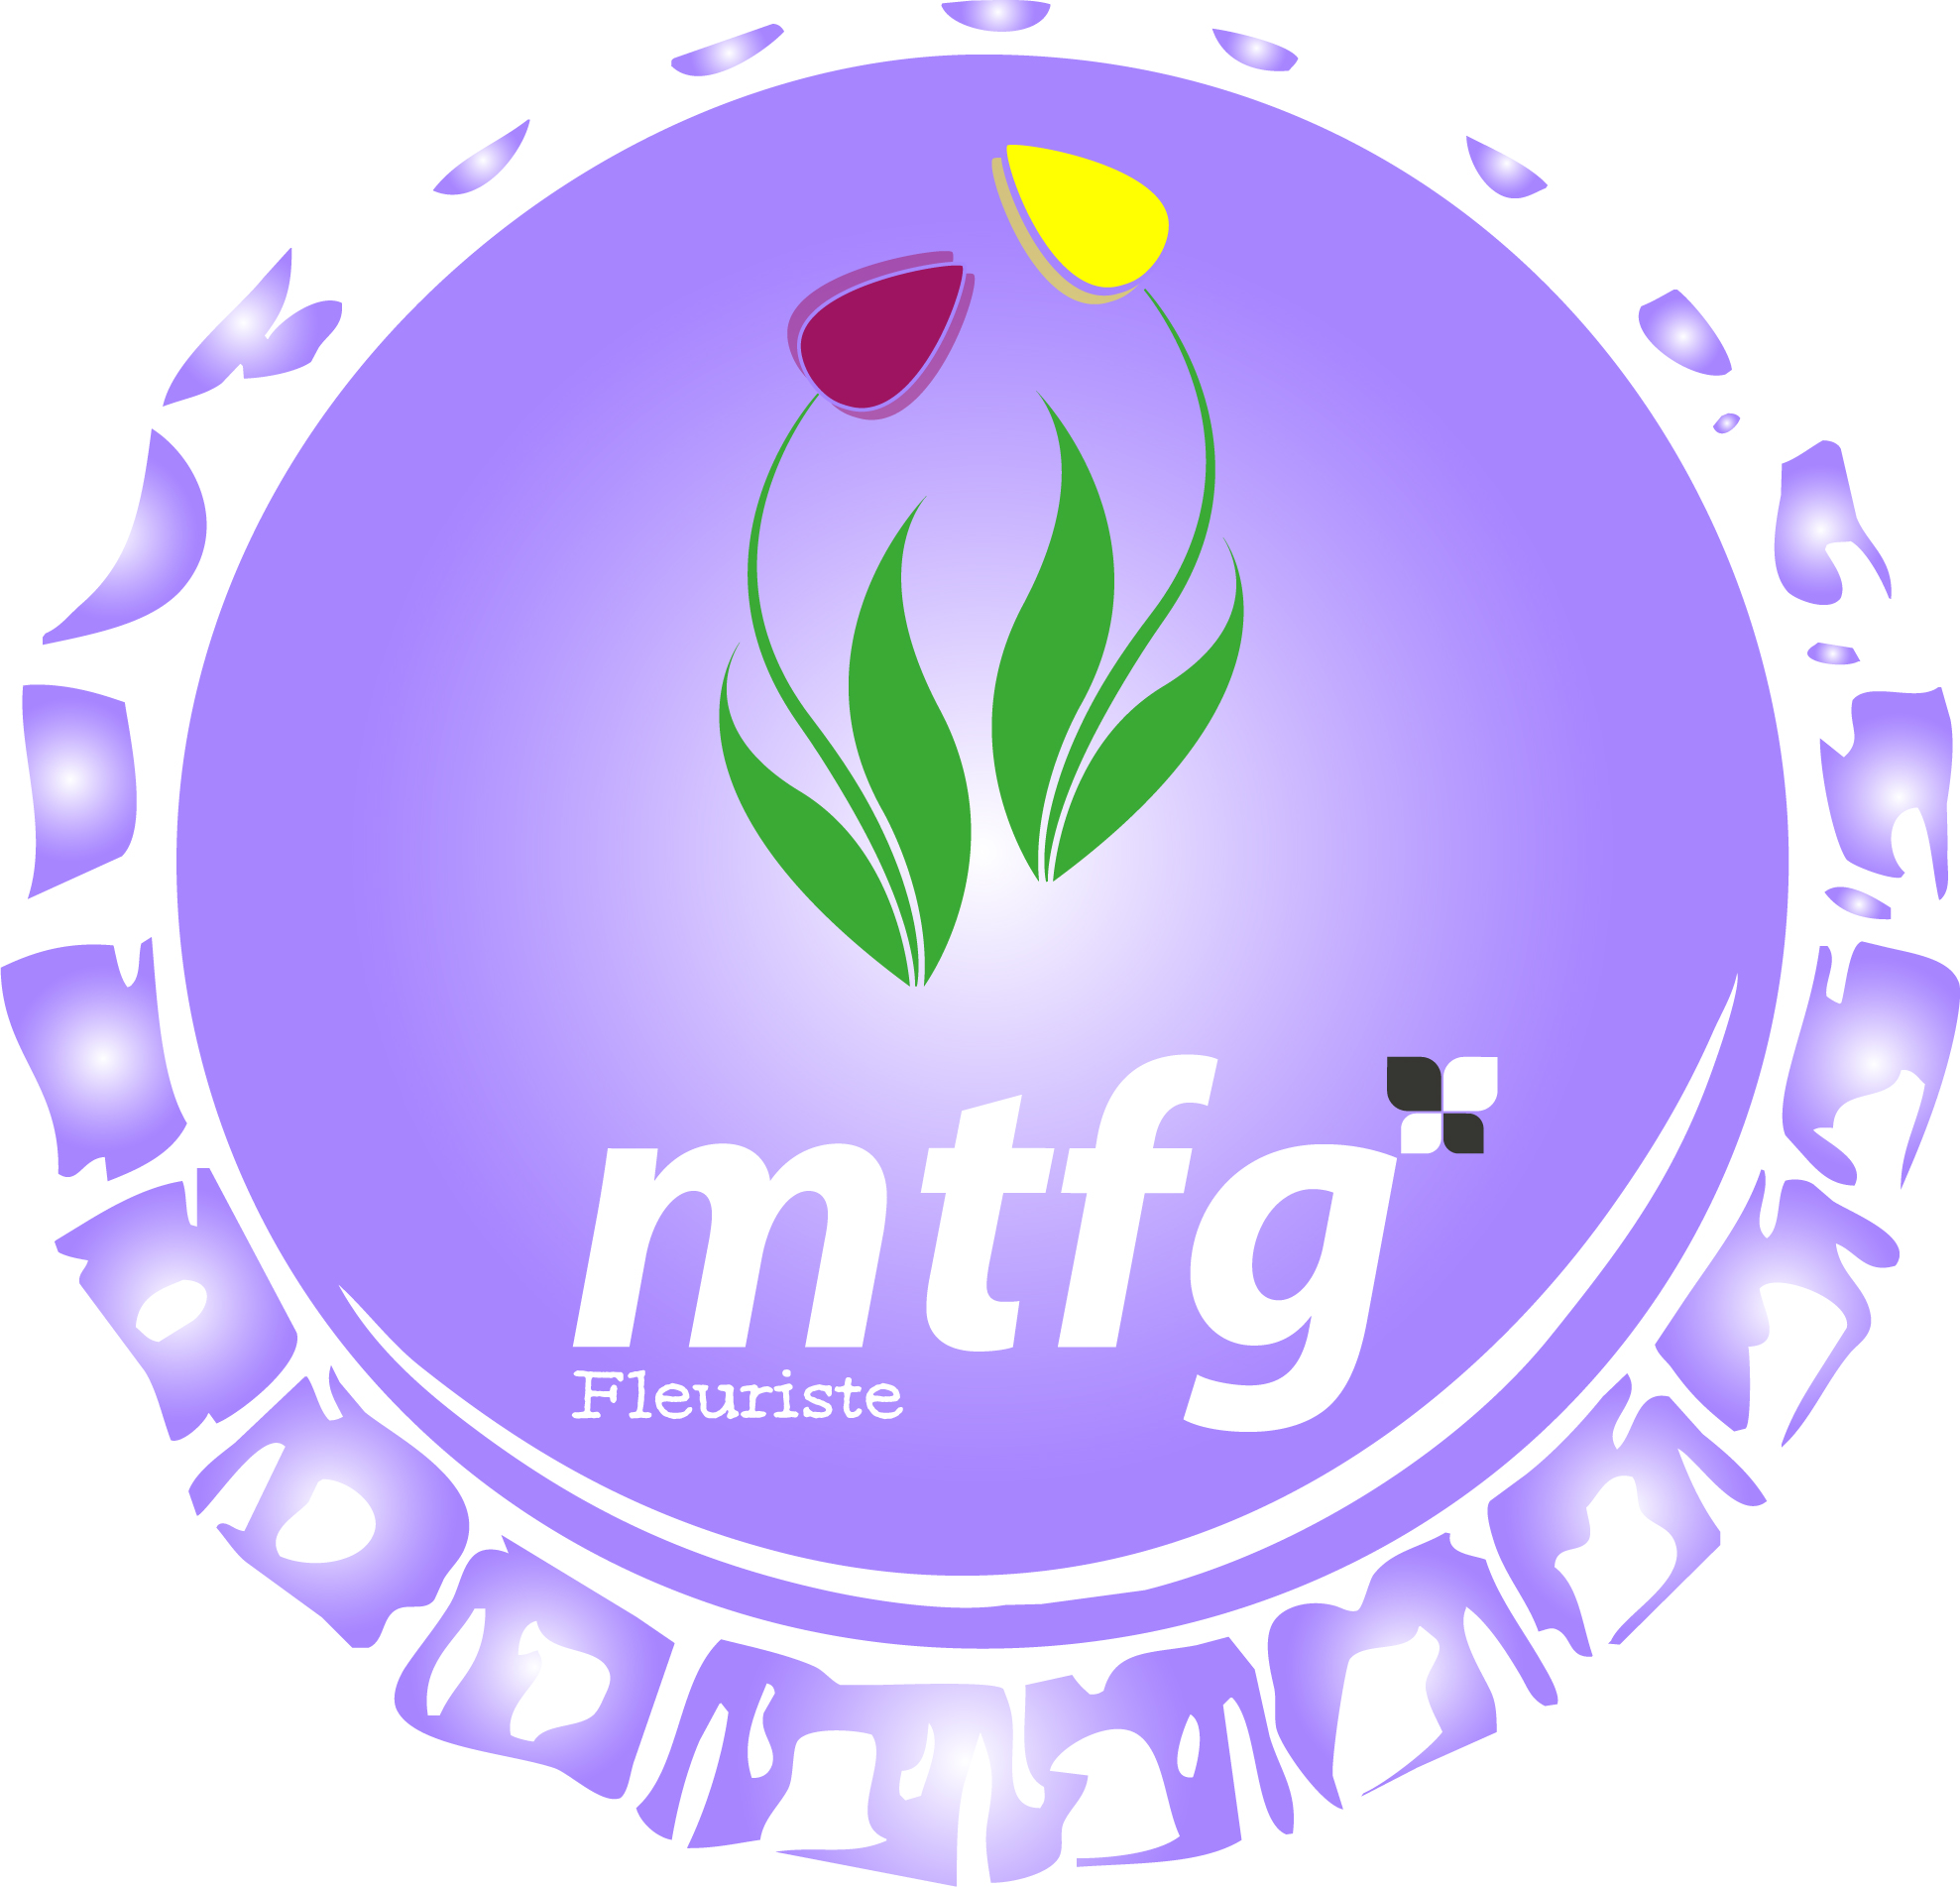 MTFG Fleuriste